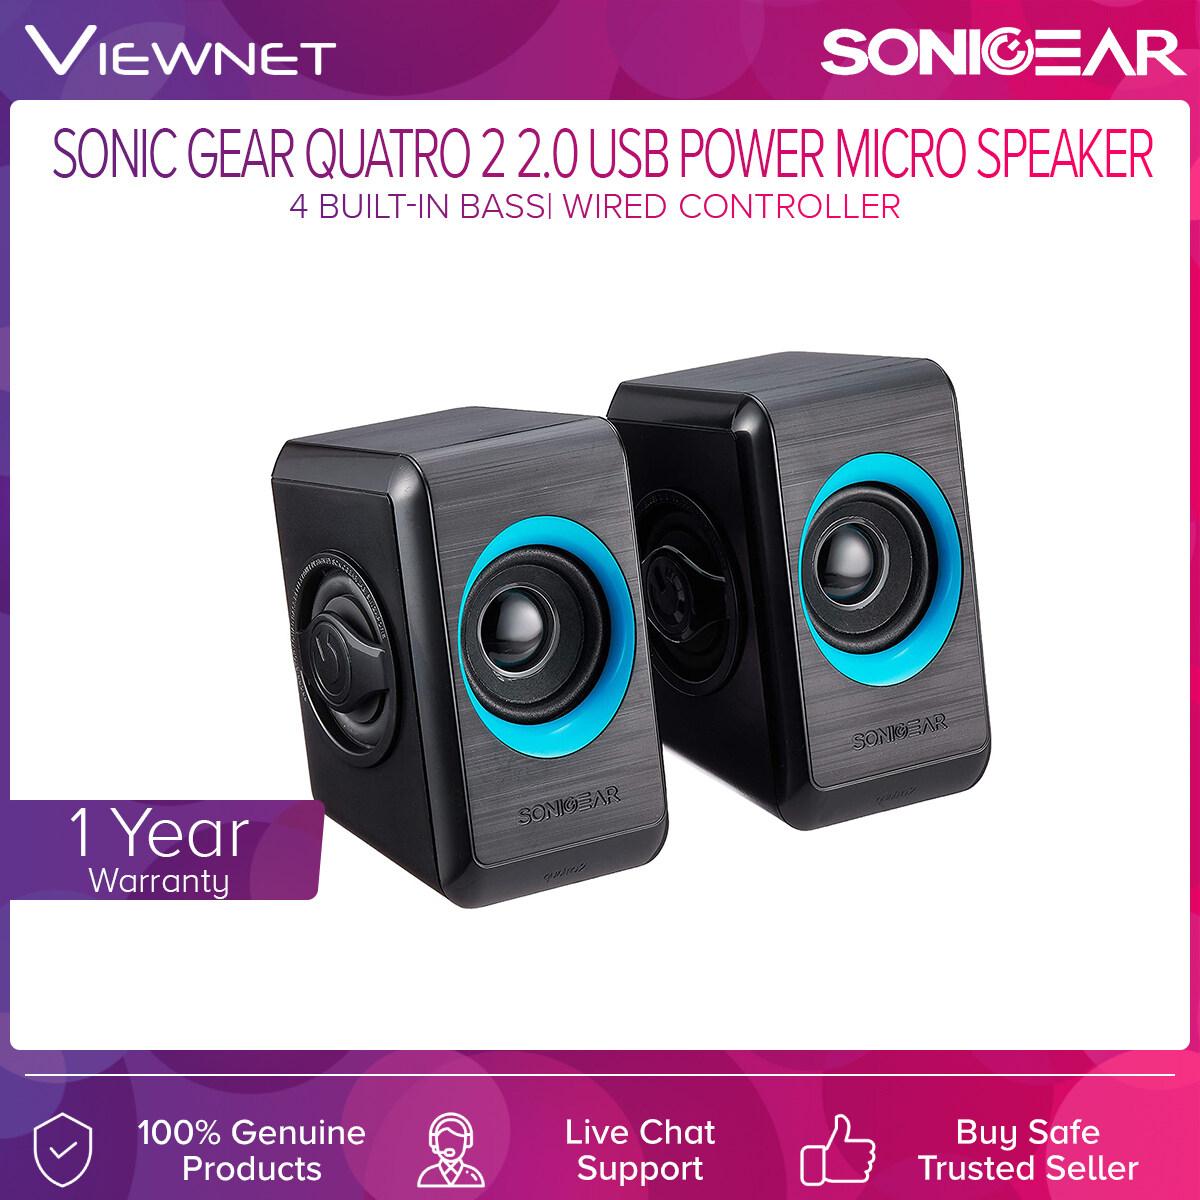 Sonic Gear Quatro 2 2.0 Speaker (B.Lime Green/ B.Sunny Orange/ B.Turquilla/ B.Festive Red)